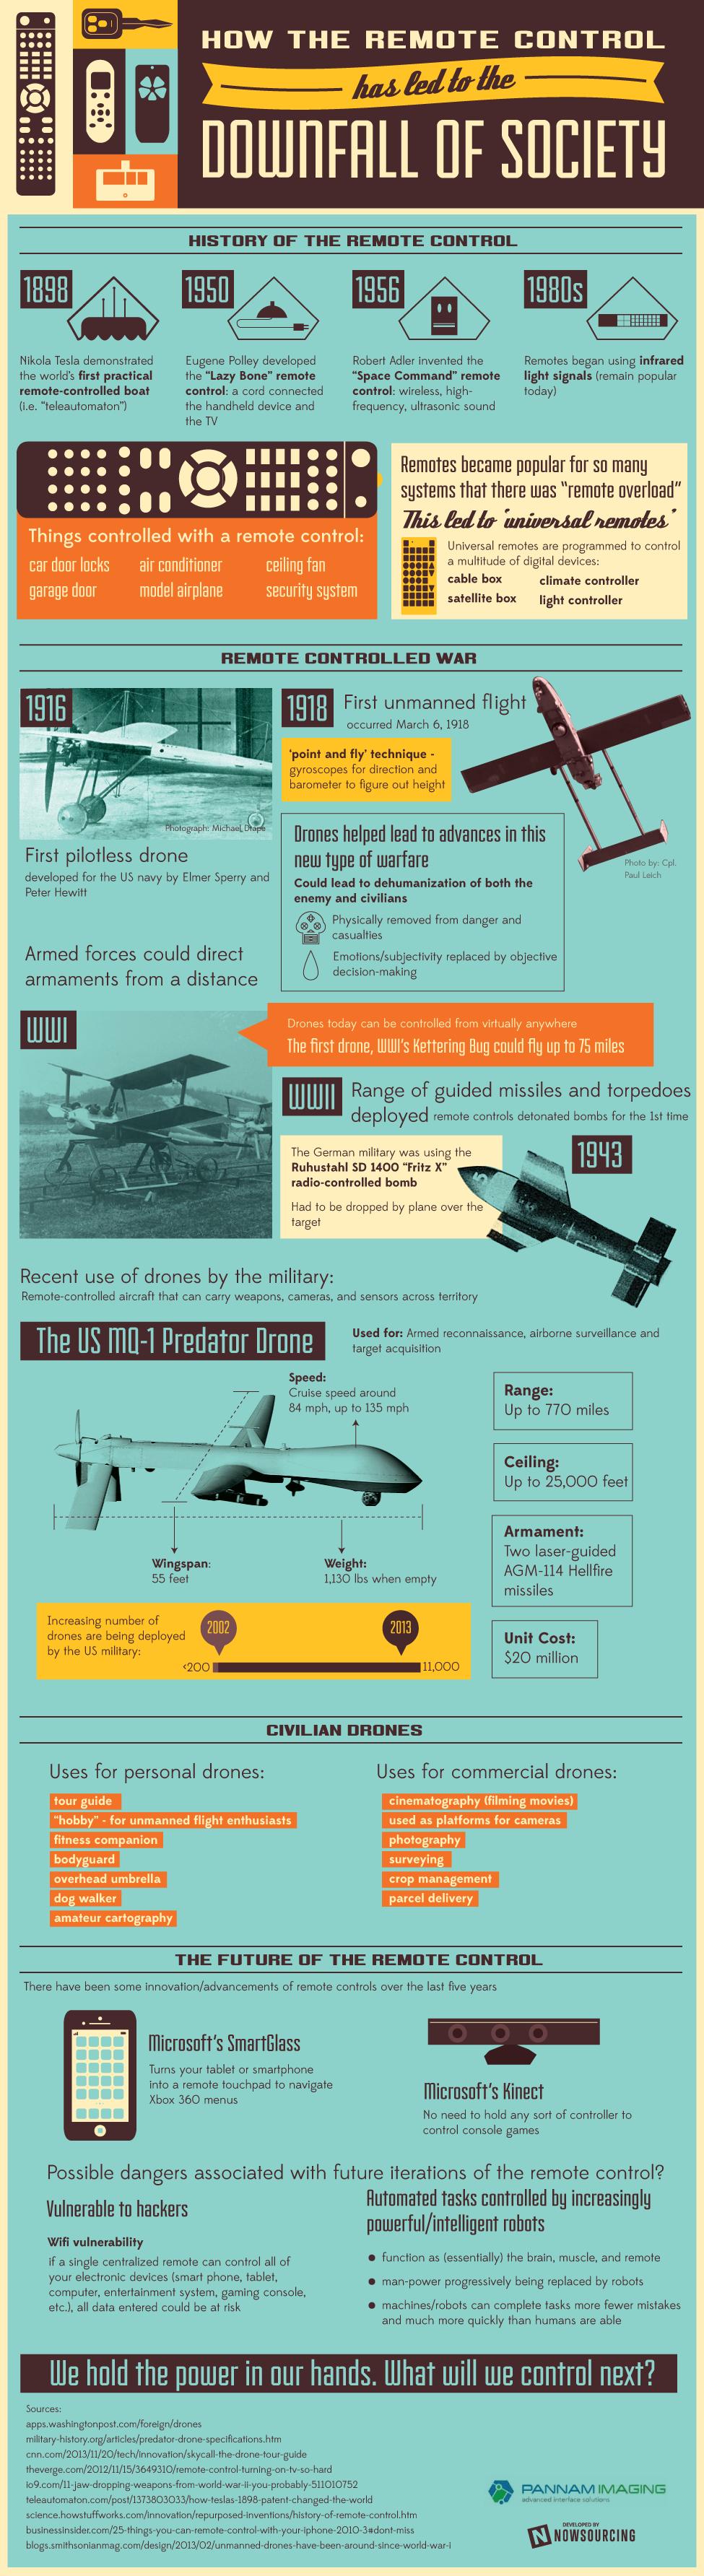 Remote Control Infographic